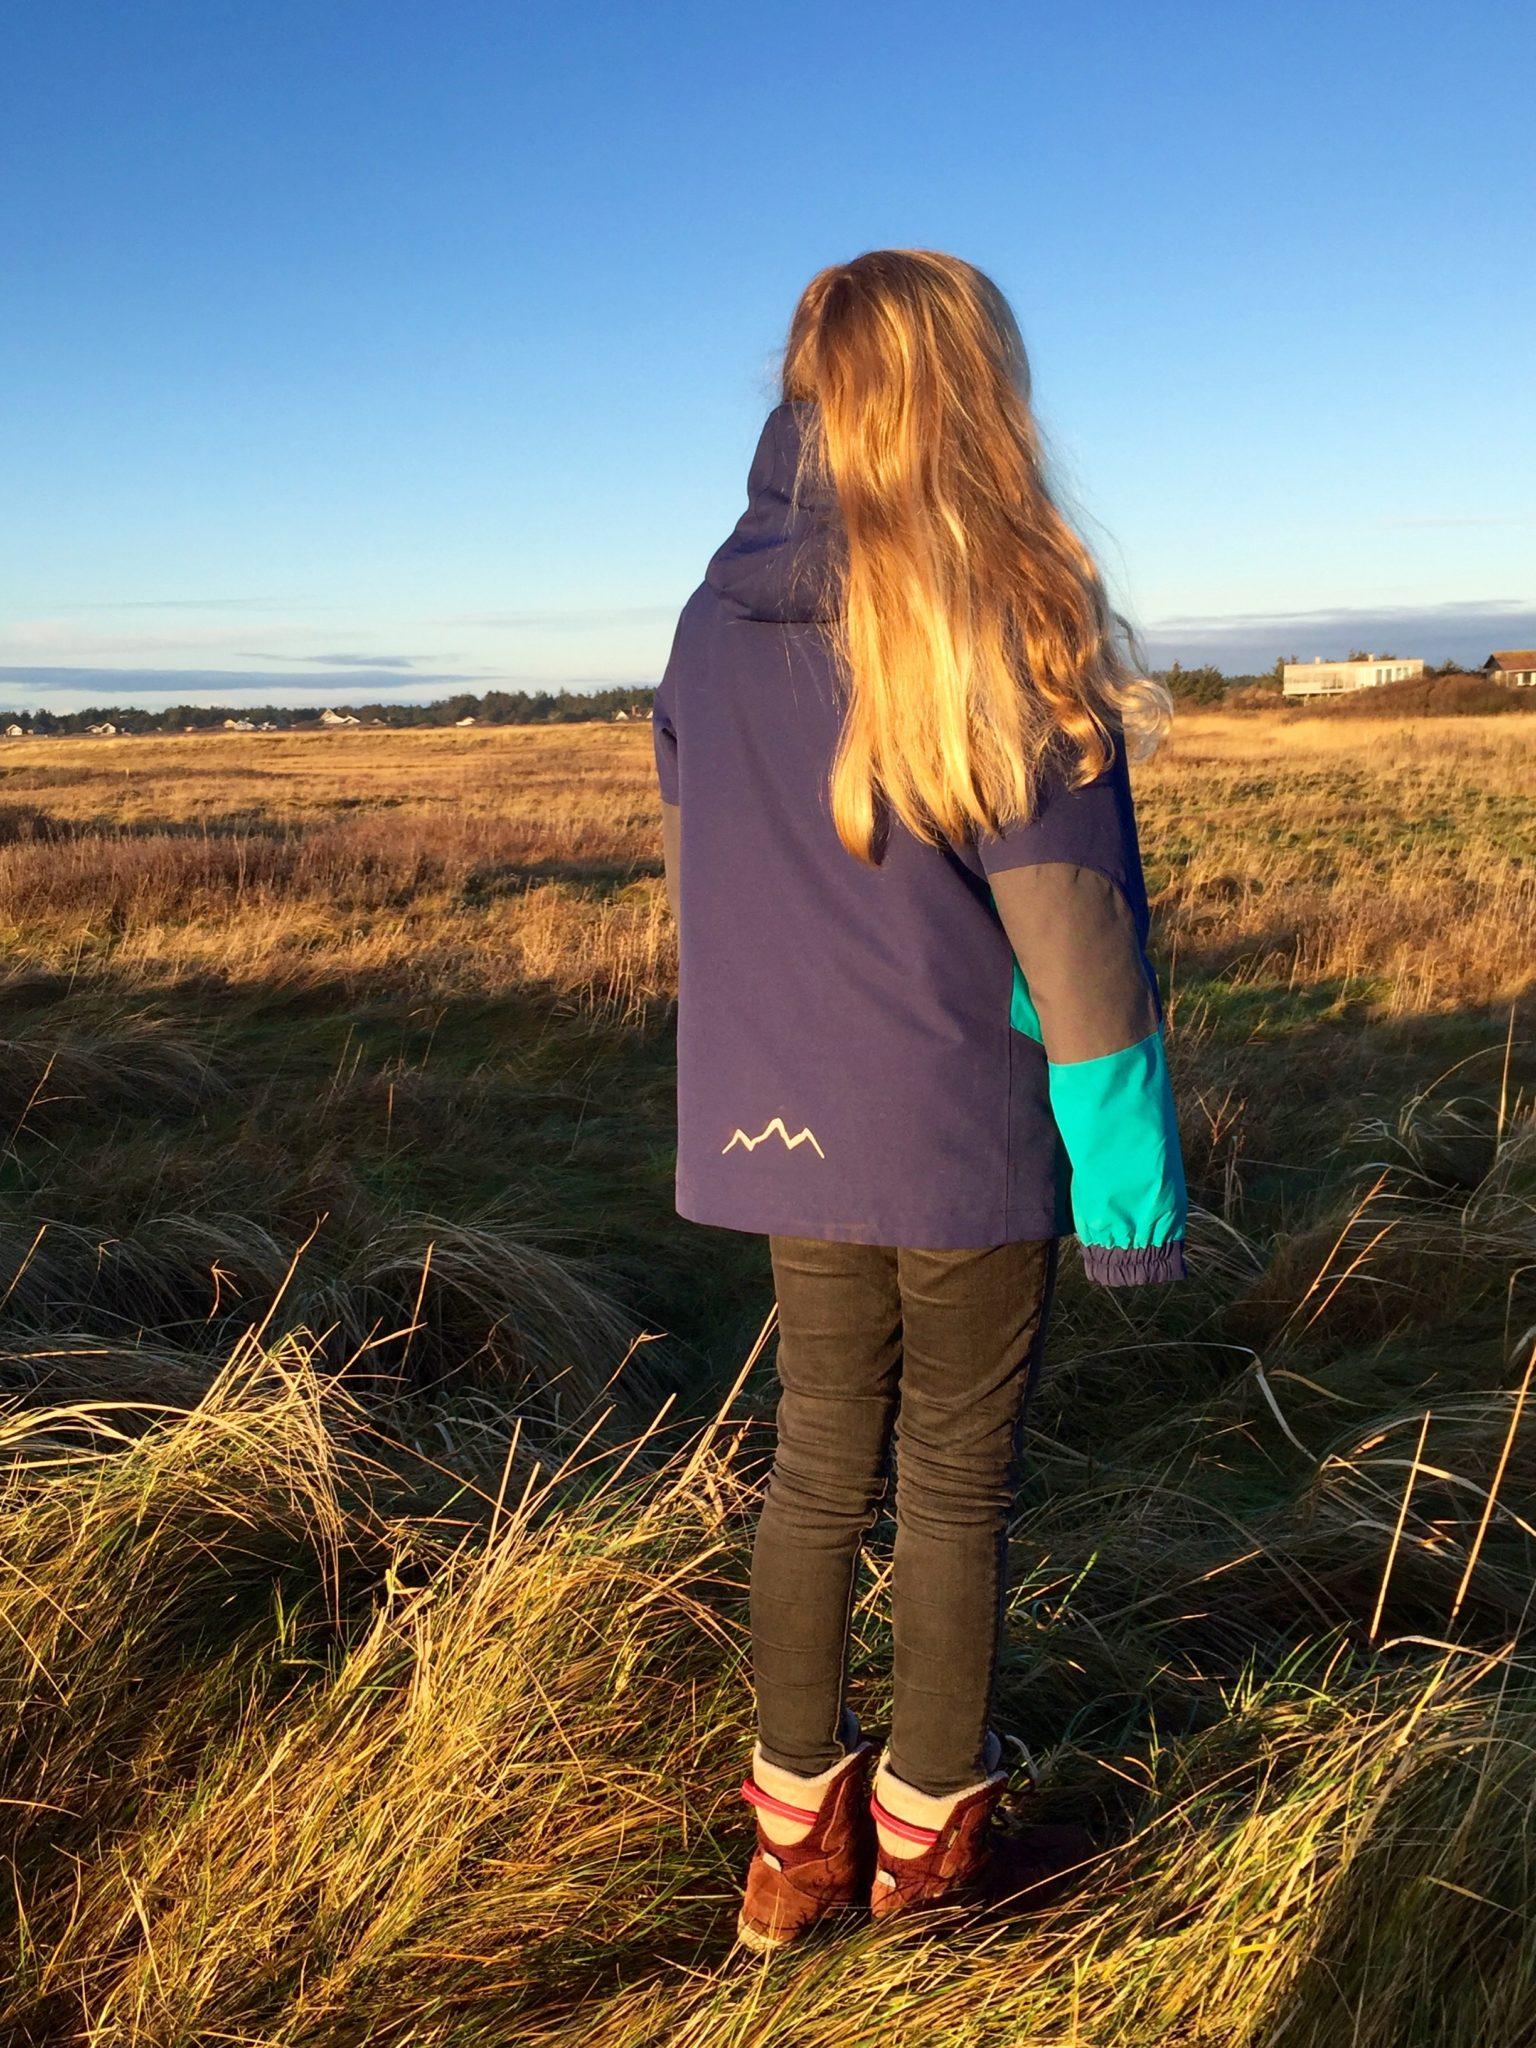 Dänemark Familienurlaub Strand Dünen wandern Sonne Meer Nordsee